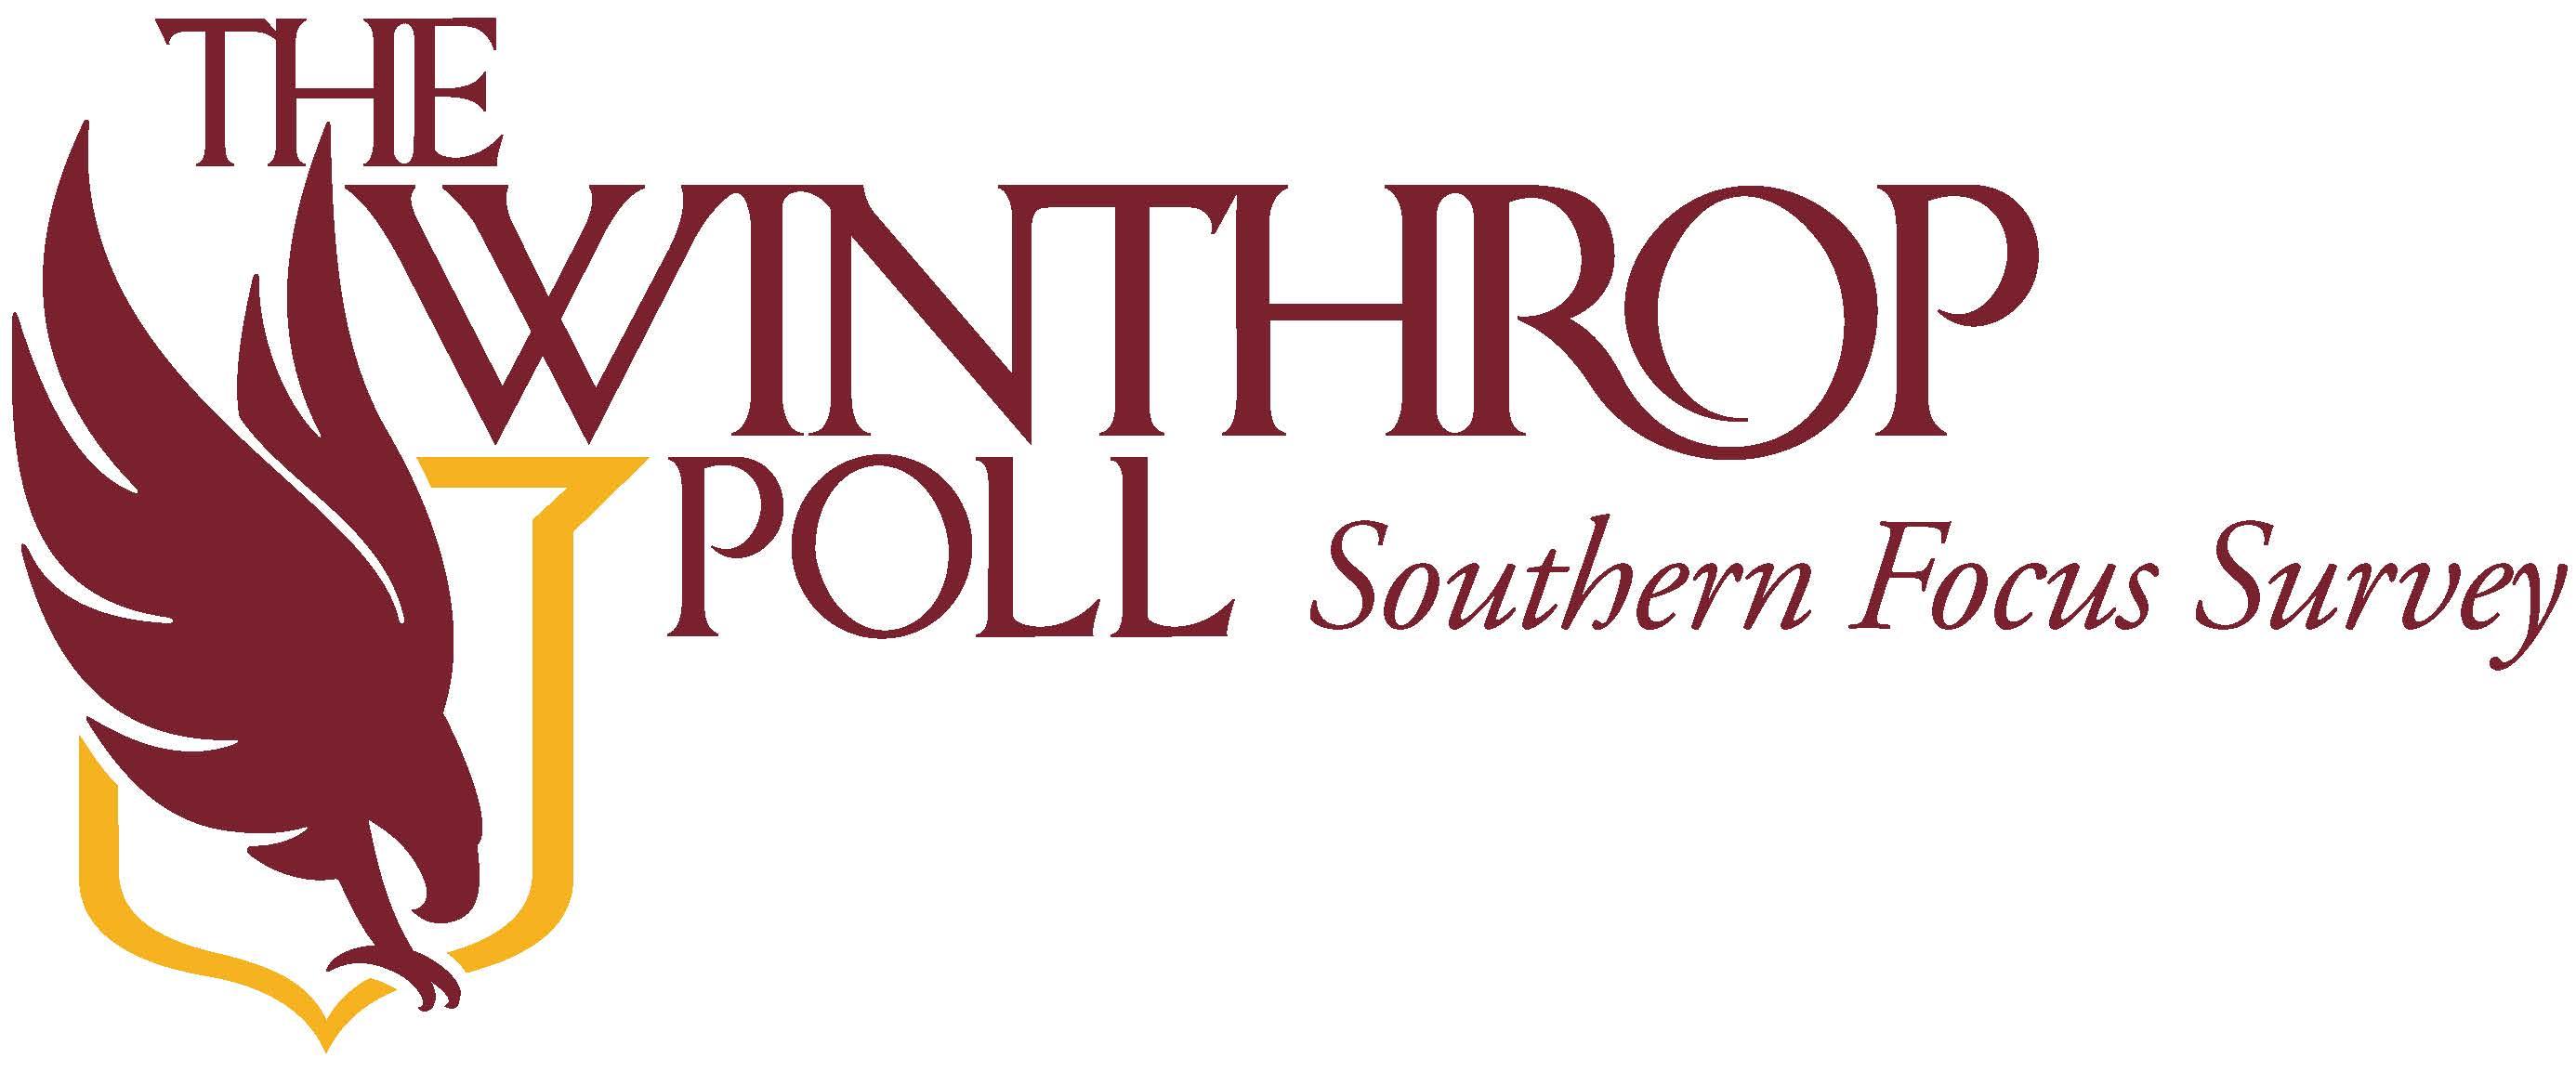 winthrop university winthrop poll current findings